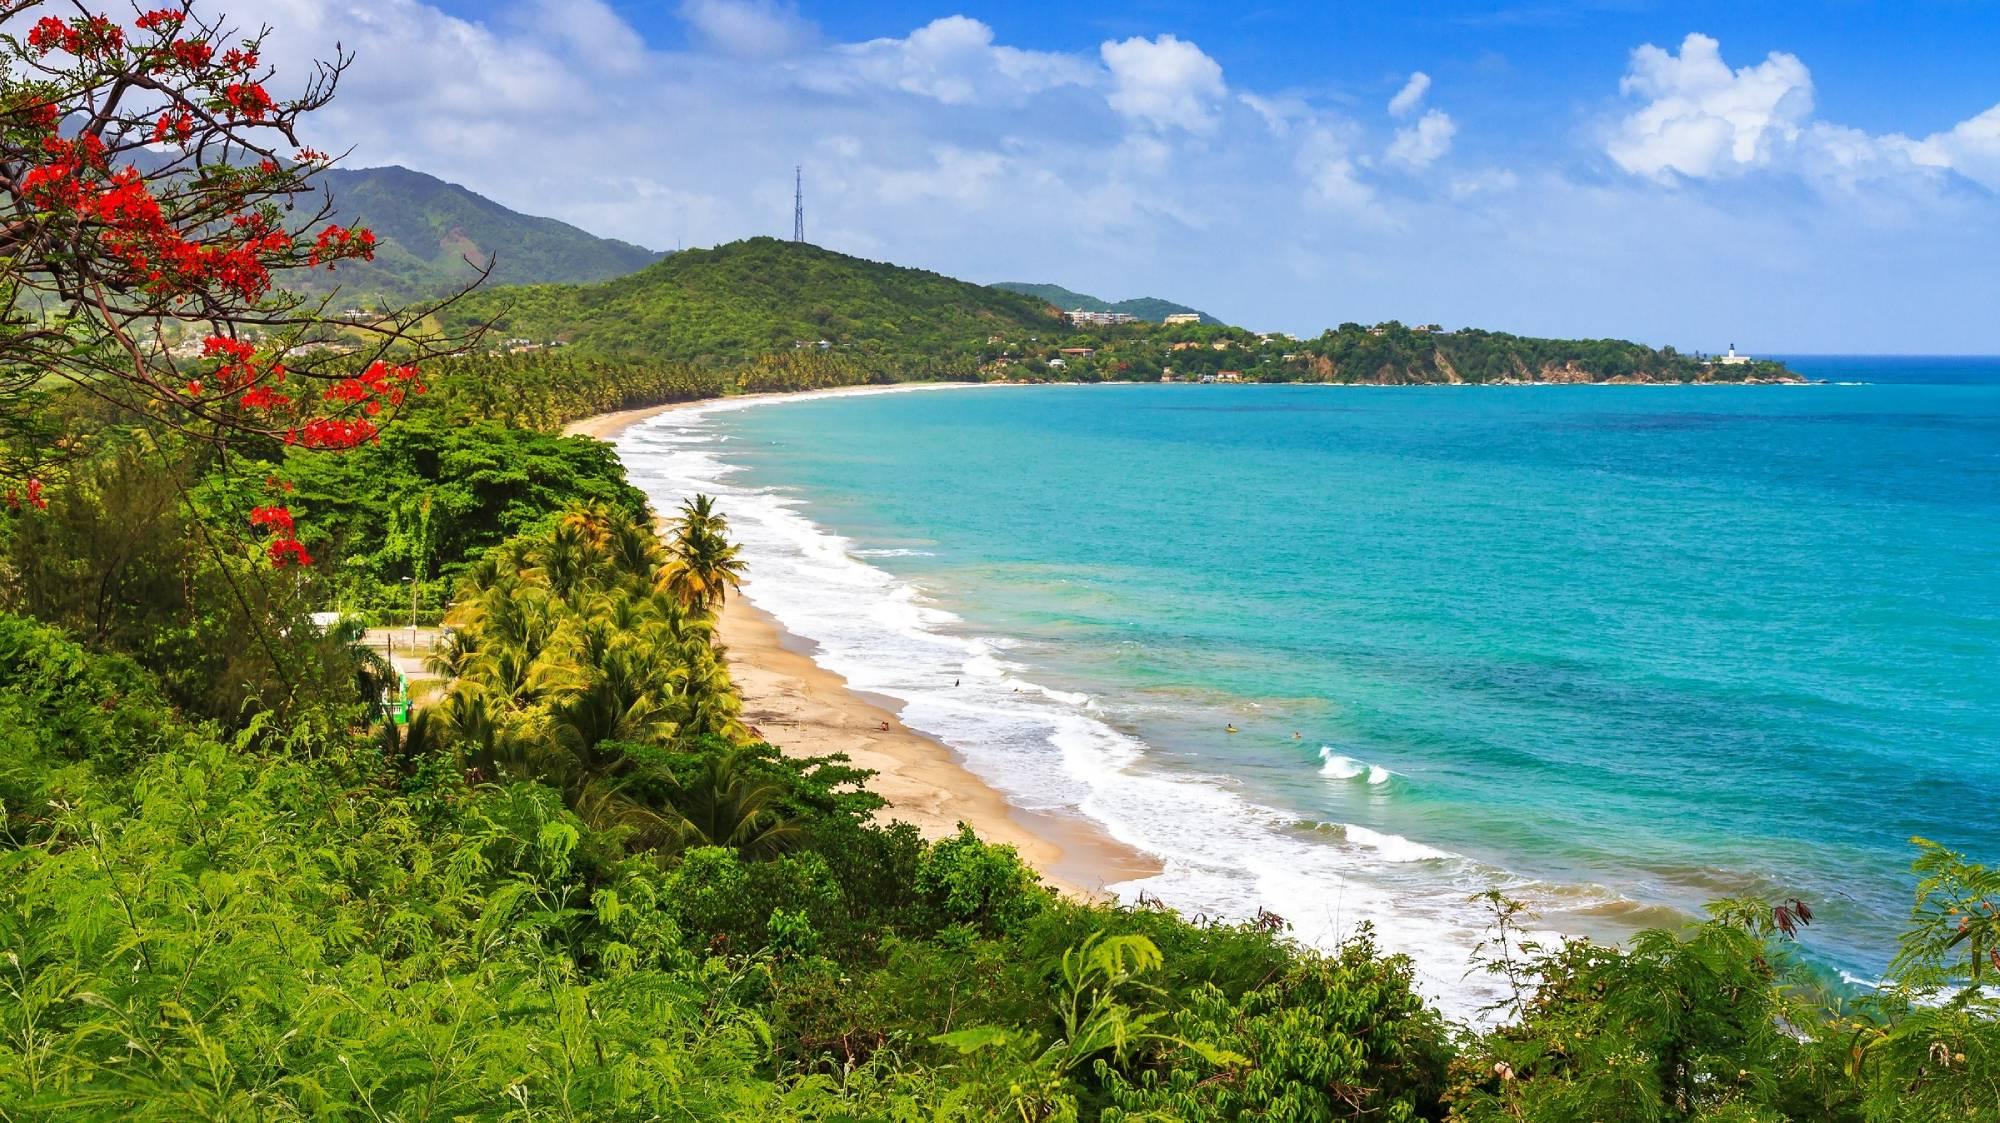 Puerto Rico - Travel Blog